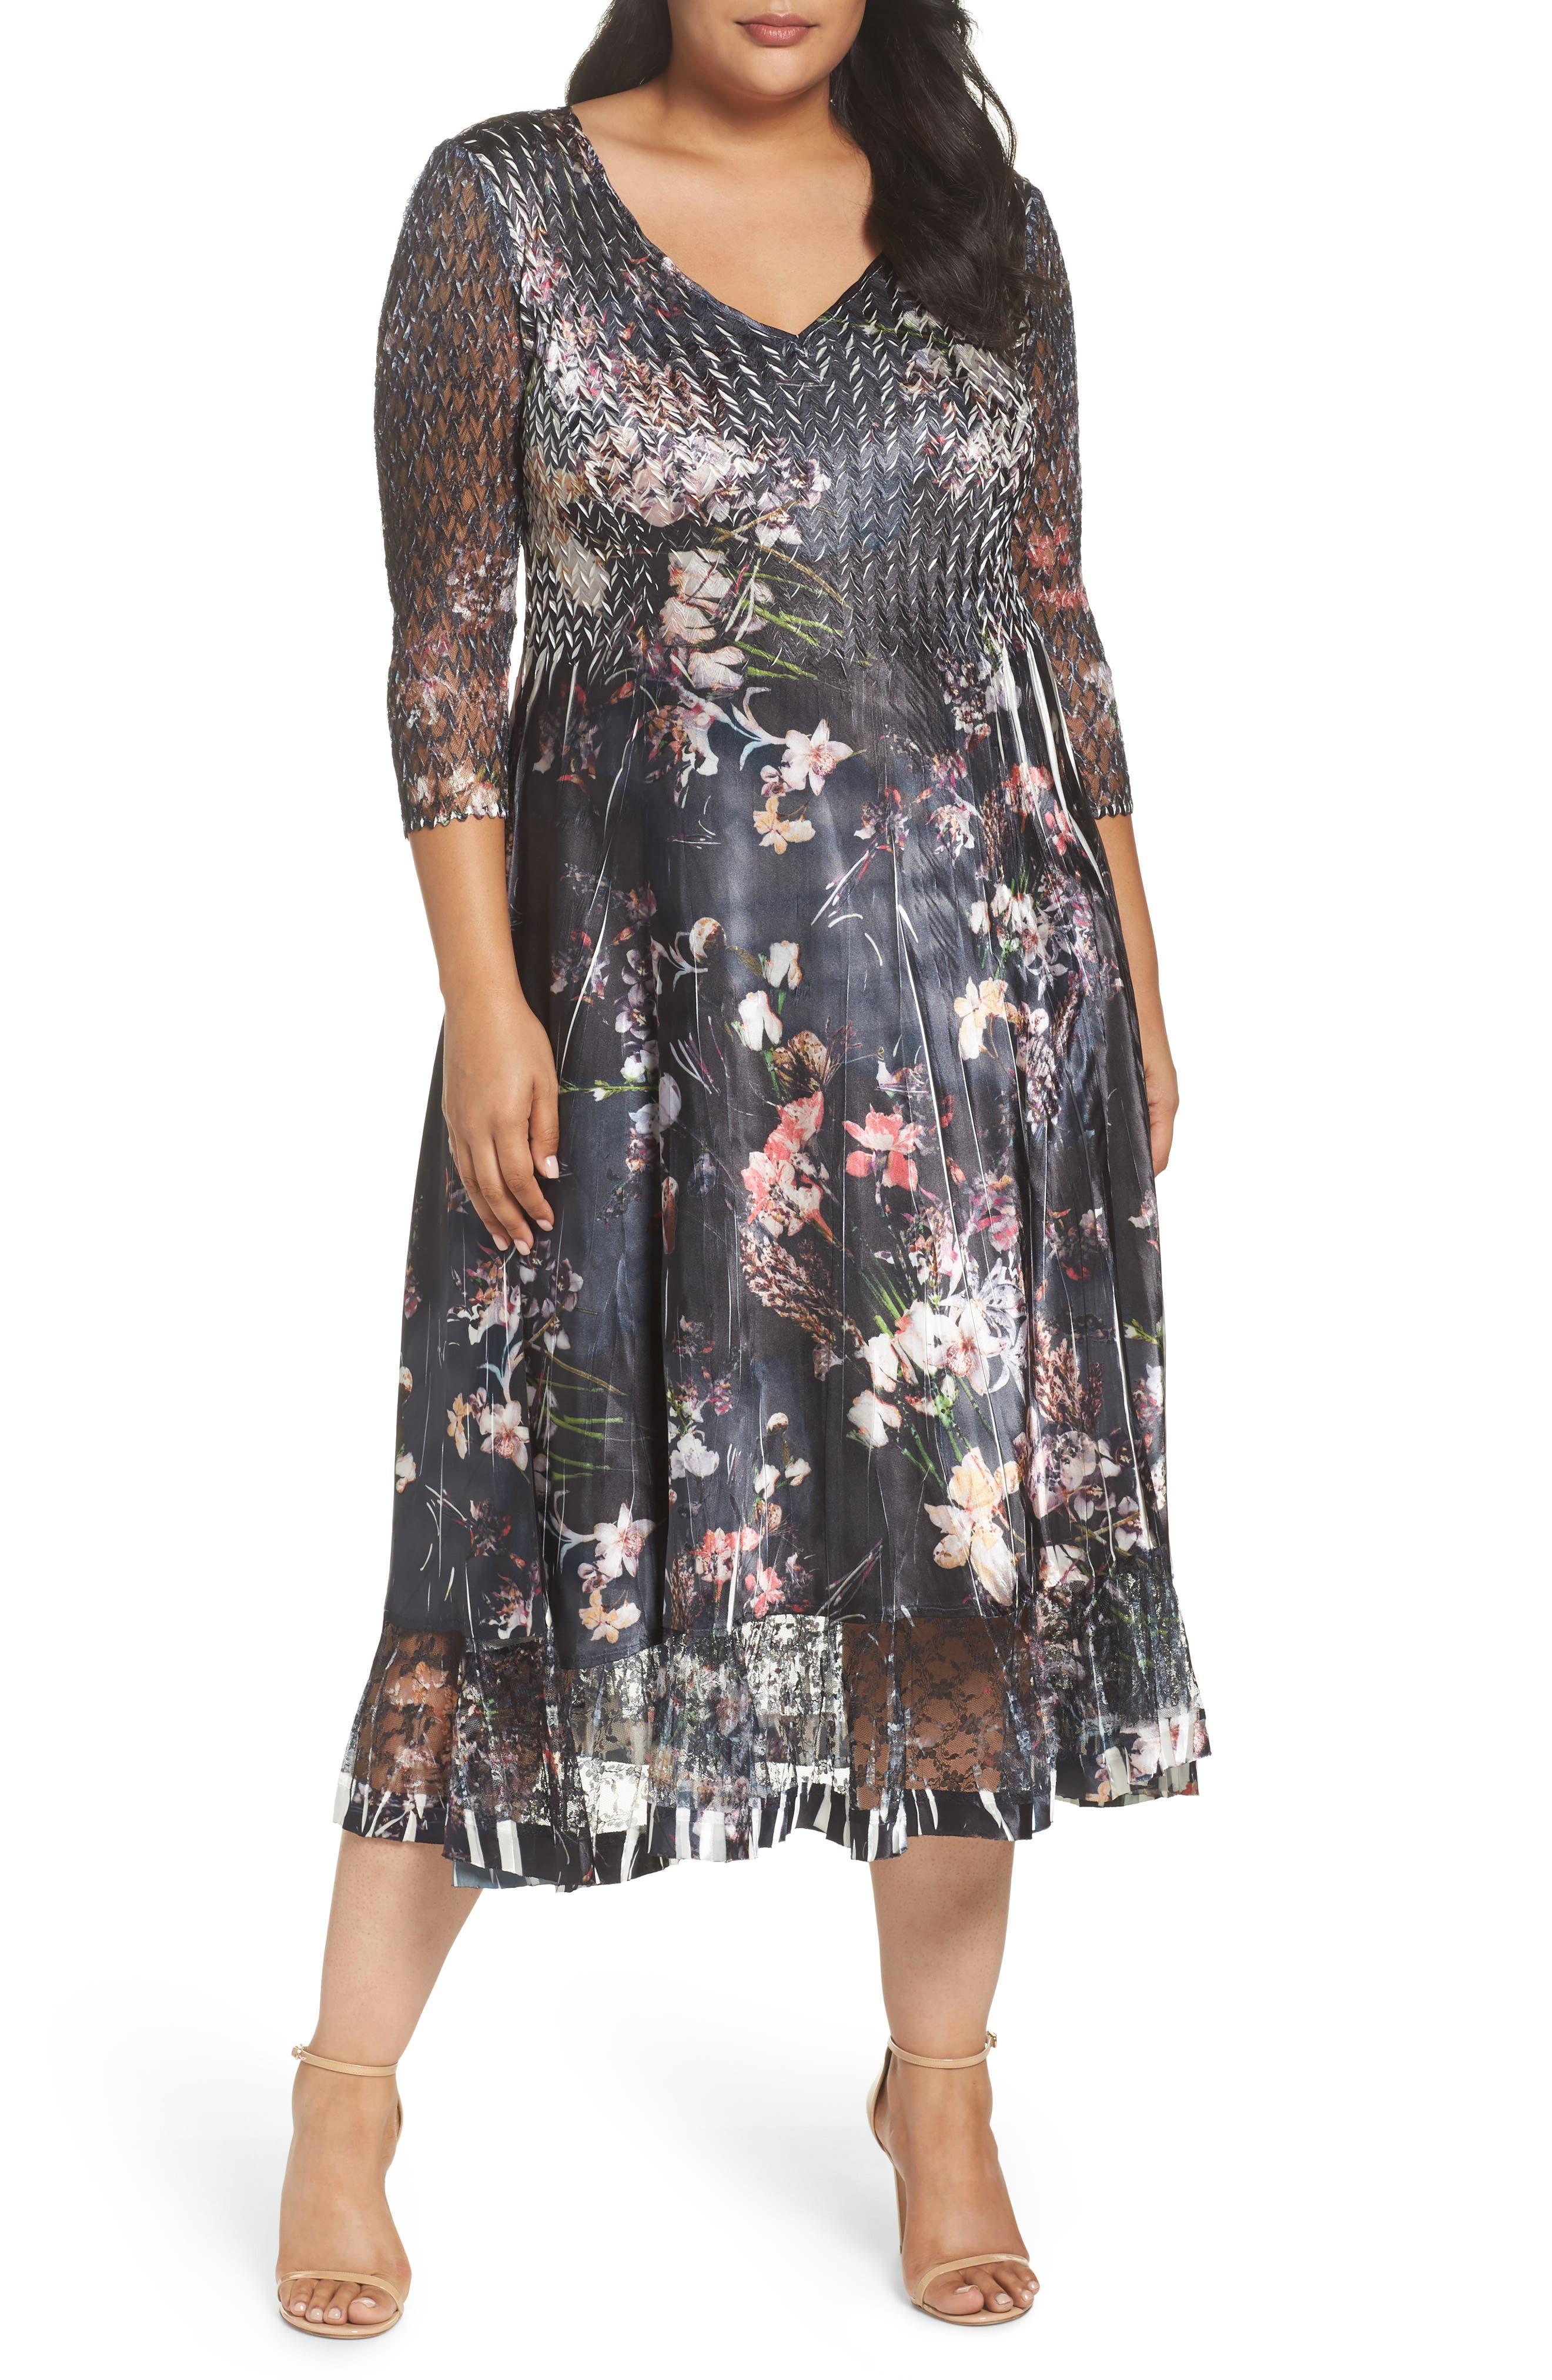 Main Image - Komarov Lace Inset Floral Chiffon A-Line Dress (Plus Size)